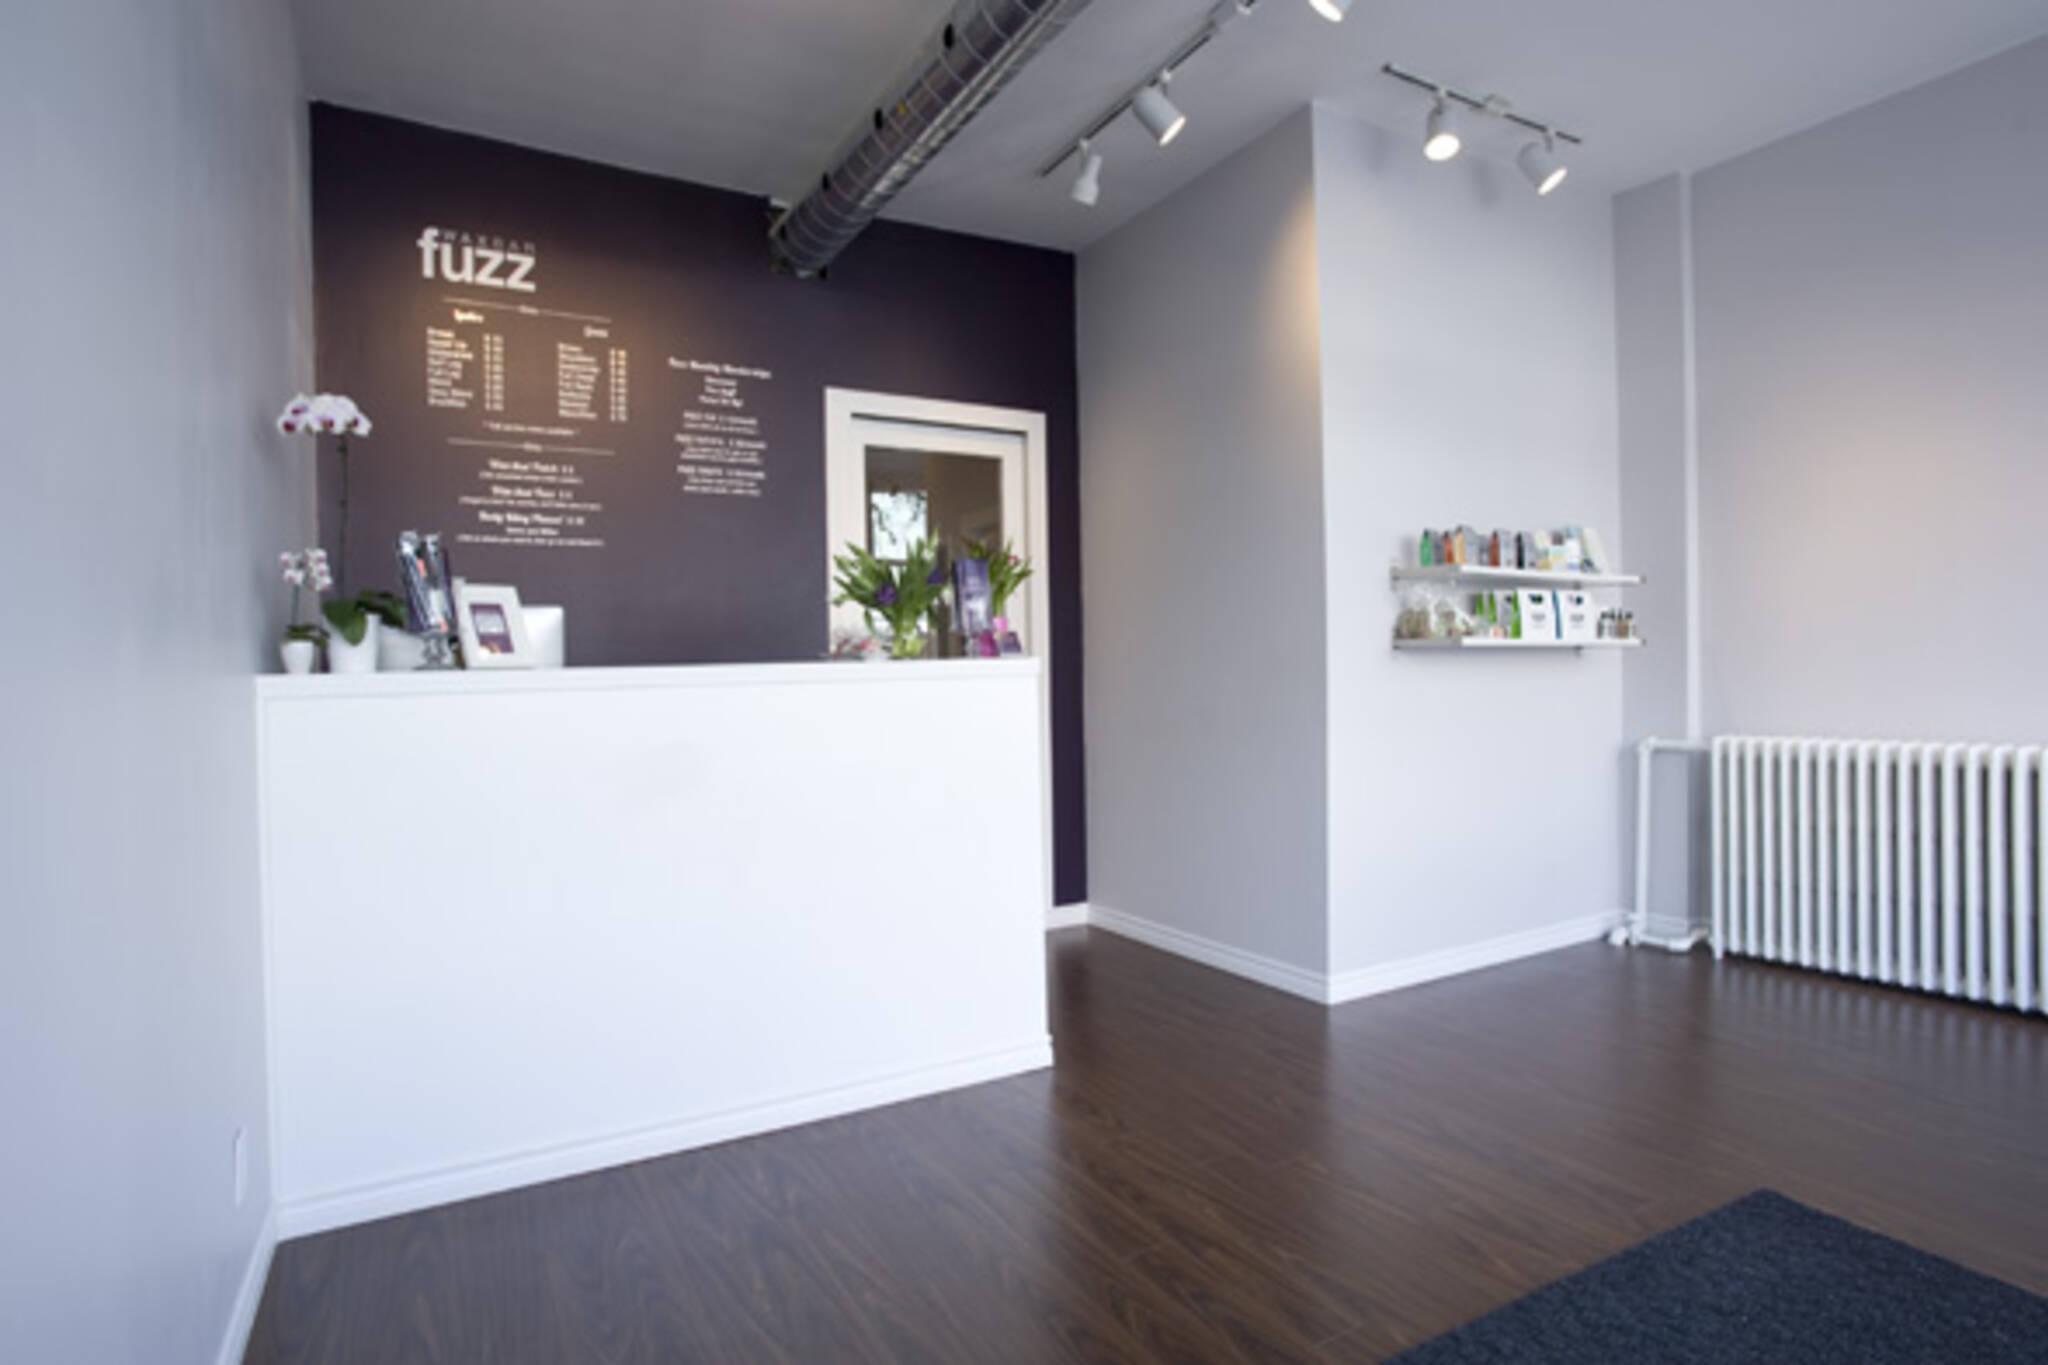 Fuzz Wax Bar